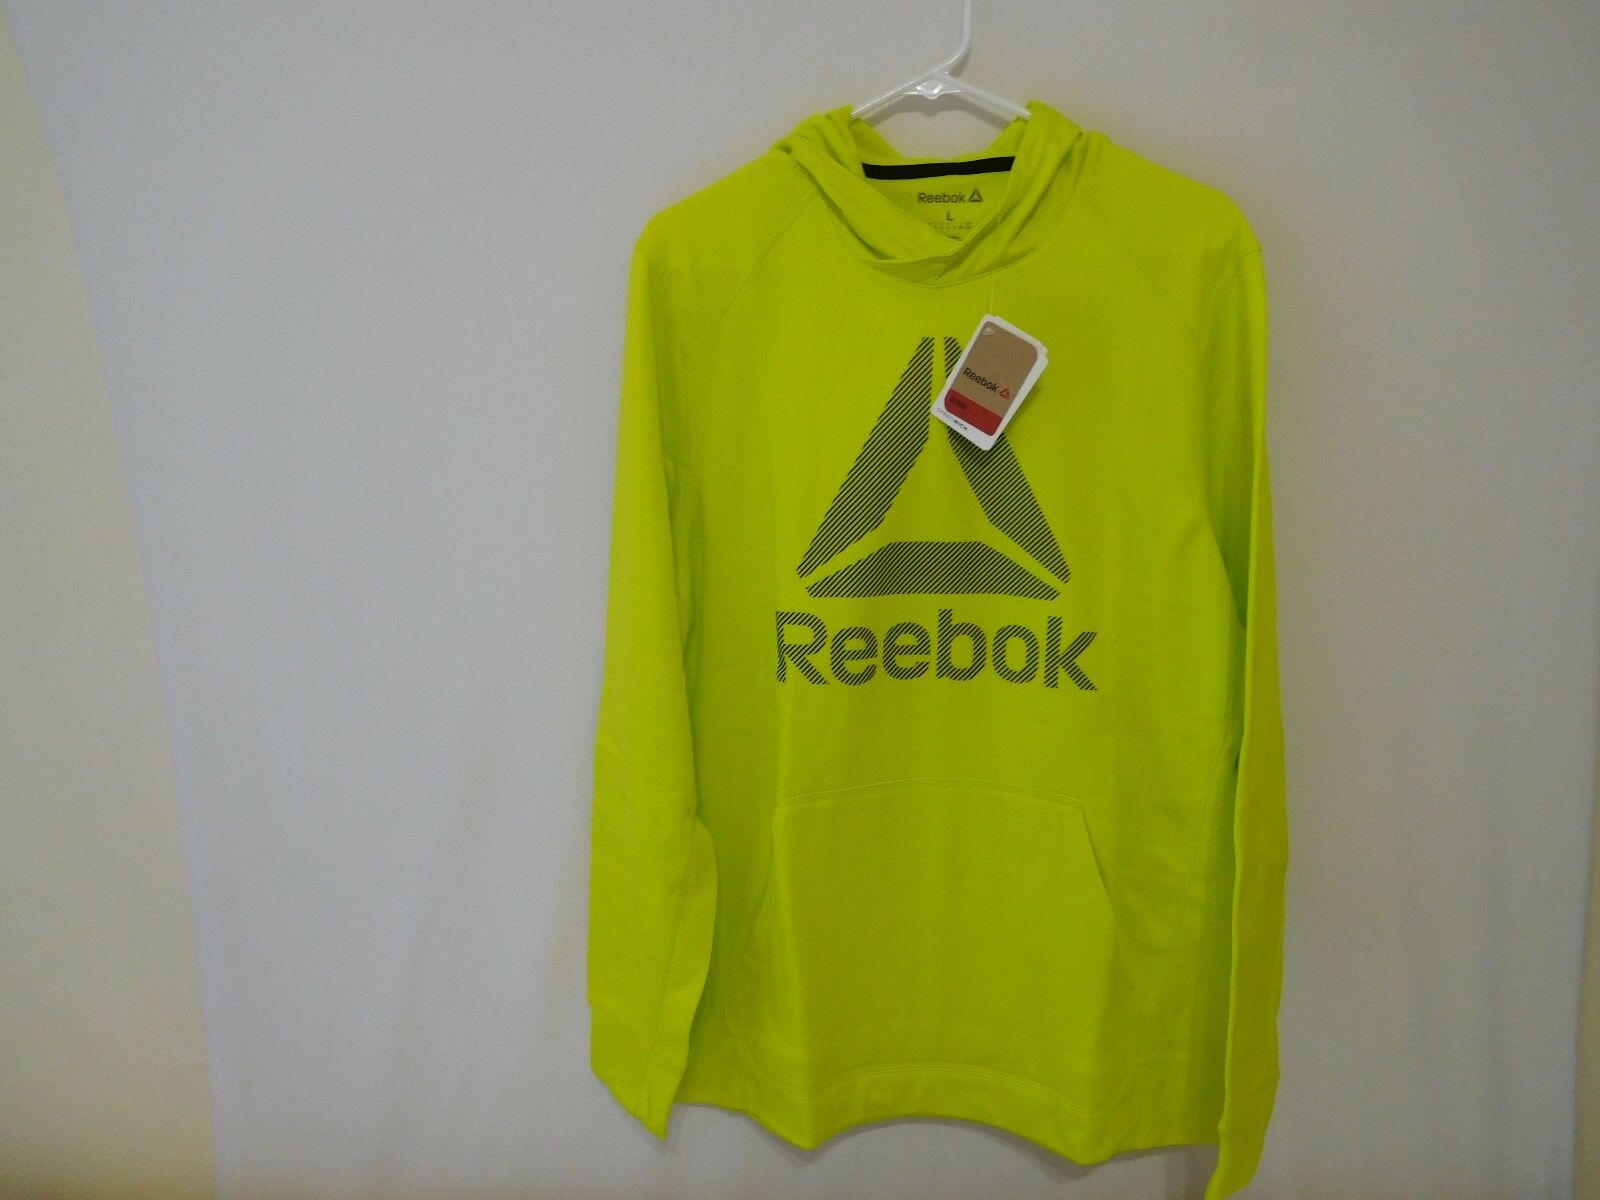 Reebok Top Warm Poly Fleece Bright Yellow -  Large L